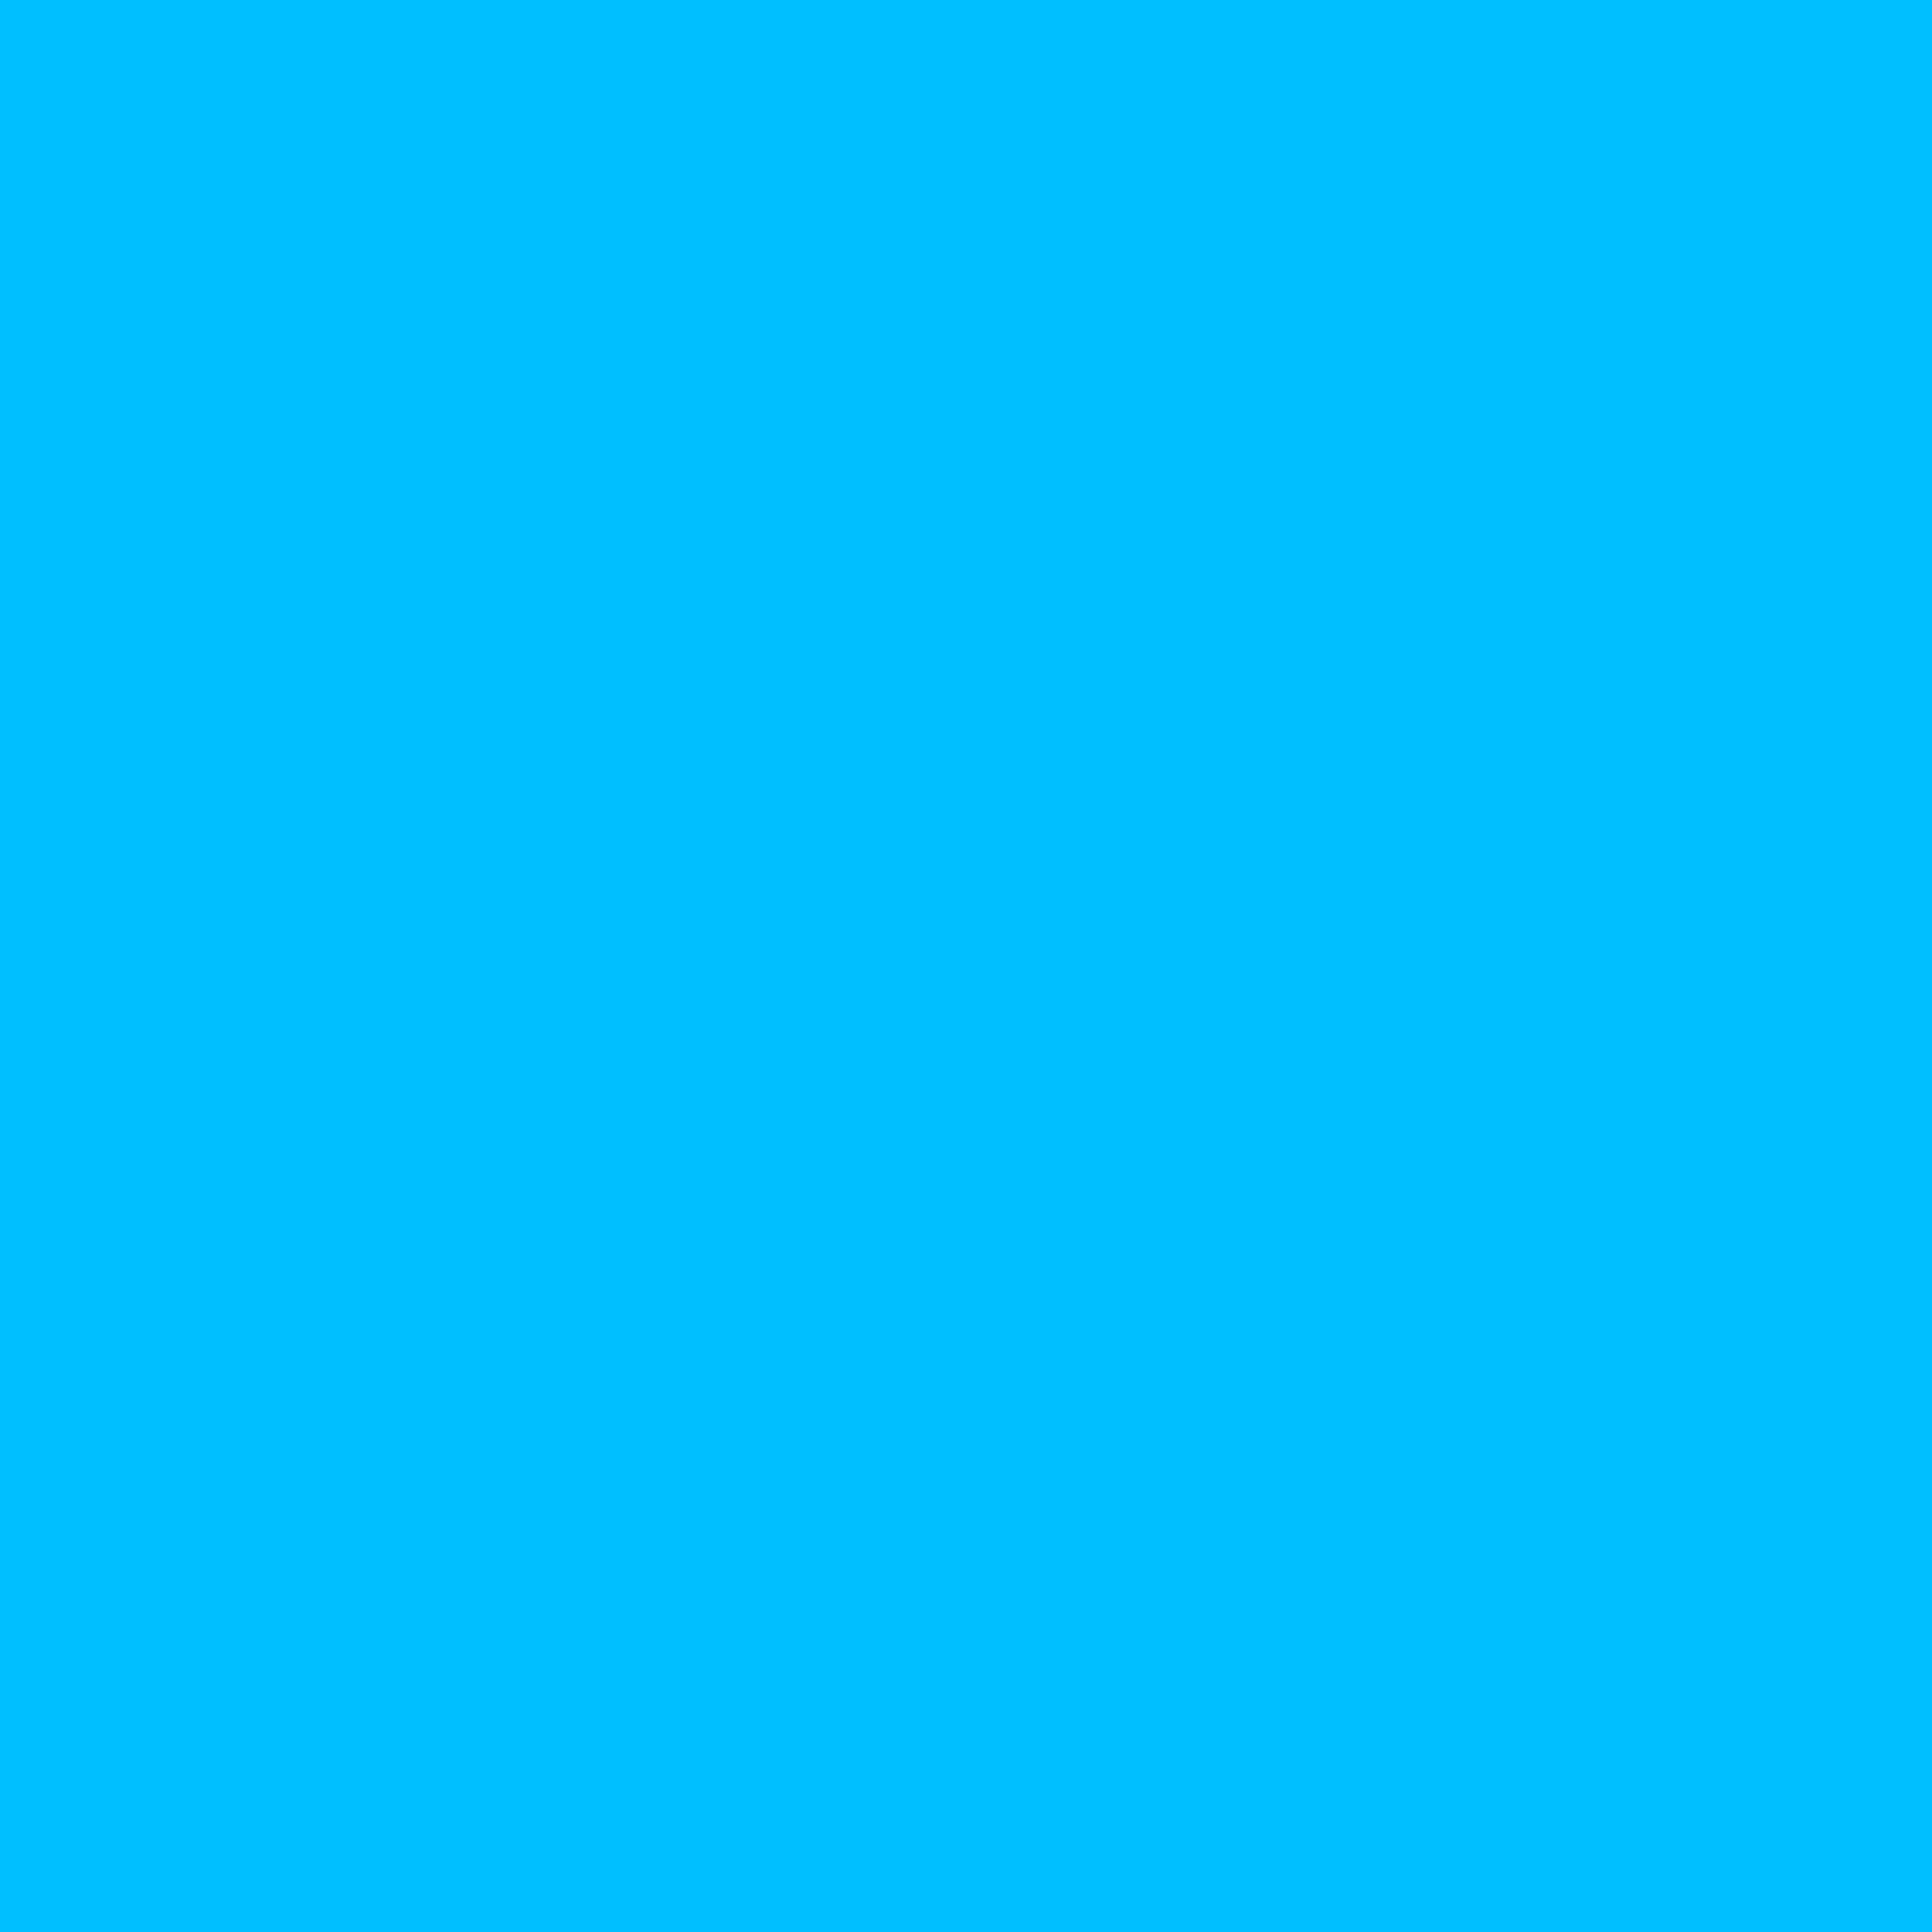 3600x3600 Capri Solid Color Background